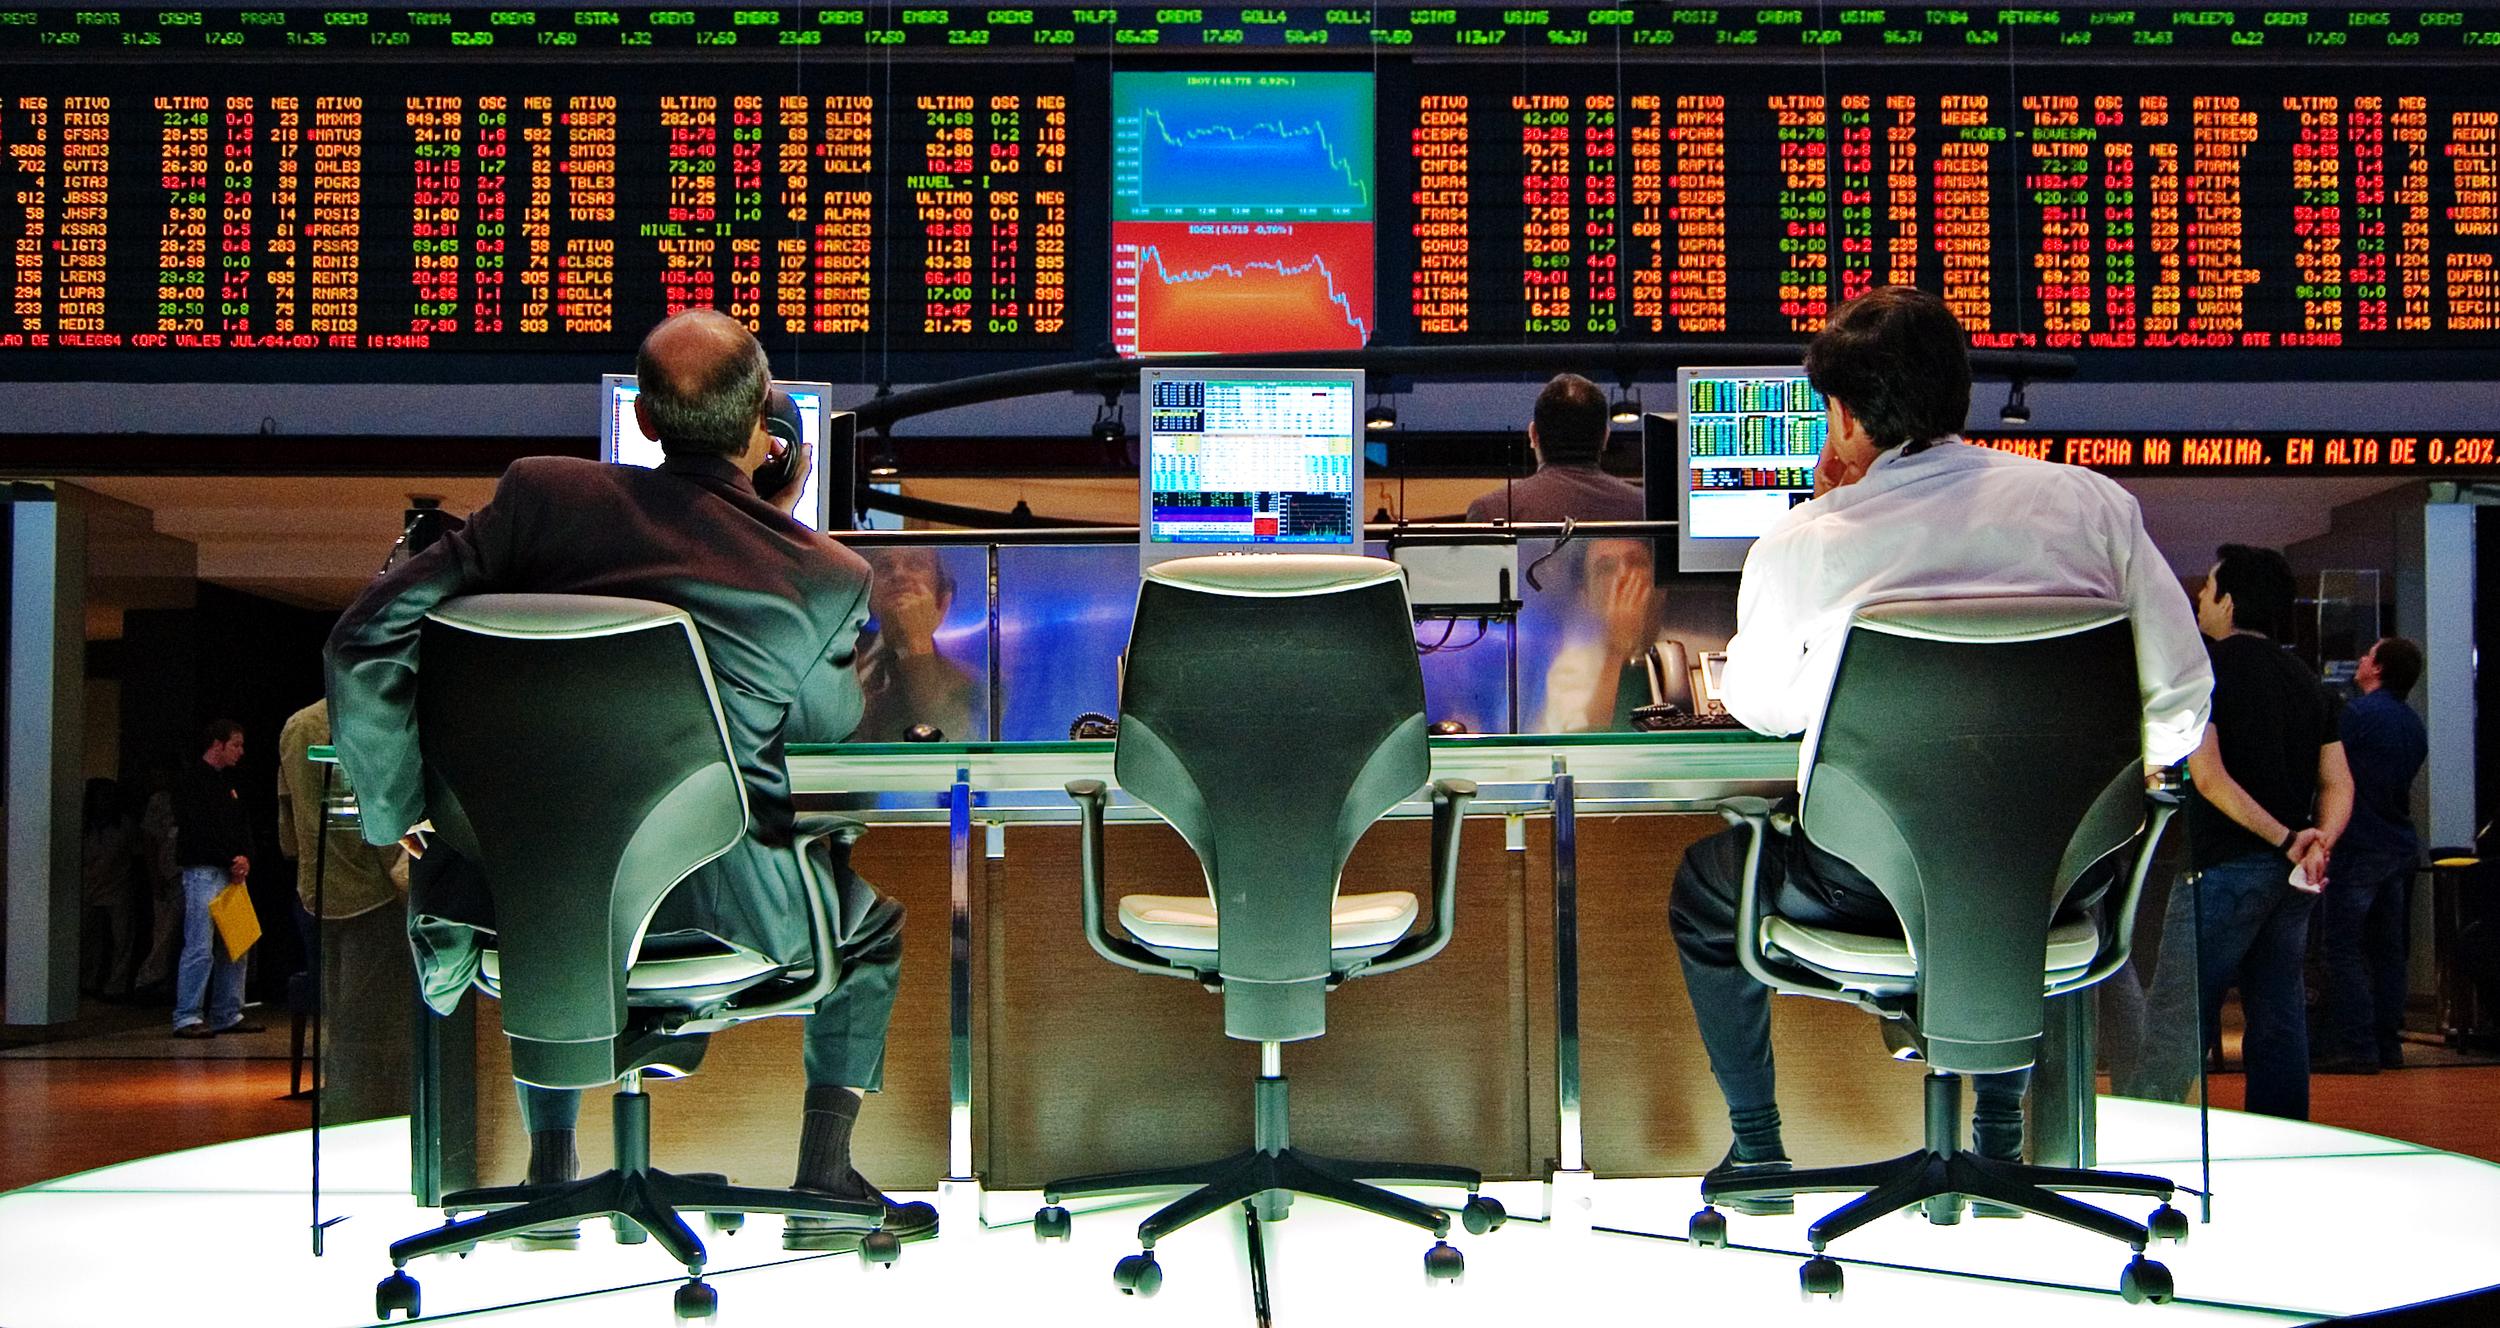 The Sao Paulo Stock Exchange (Bovespa) by Rafael Matsunaga, CC